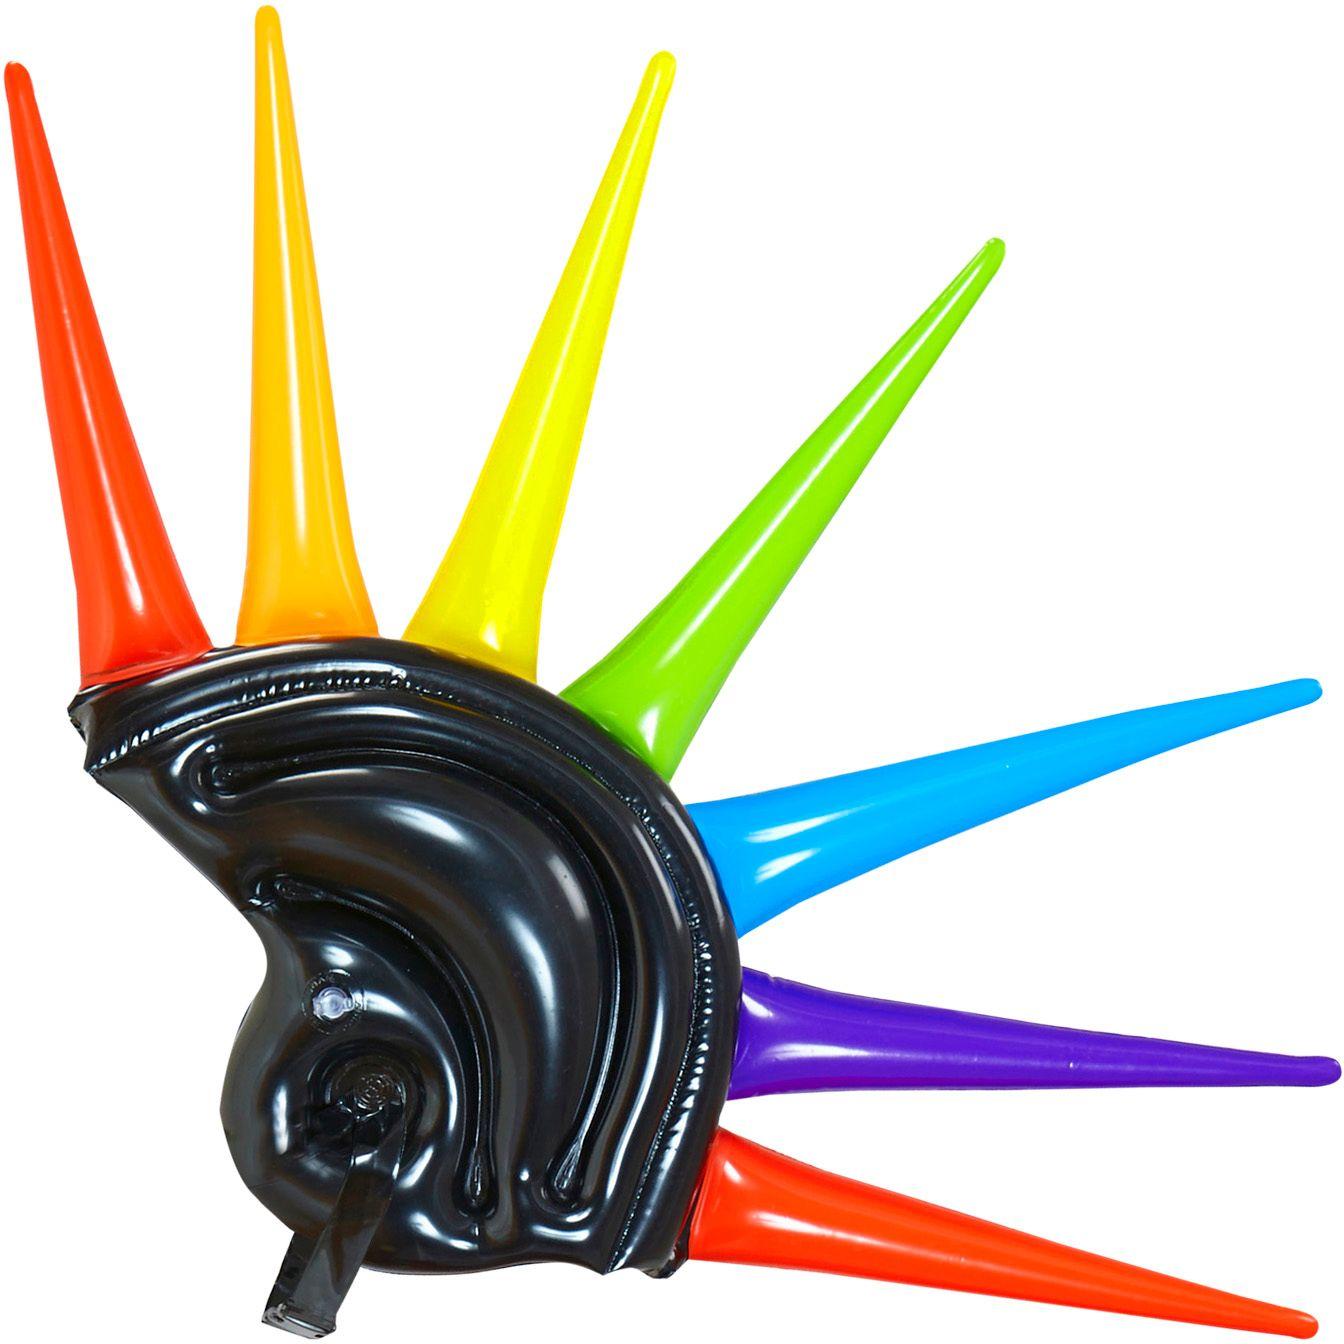 Opblaasbare meerkleurige spikes helm